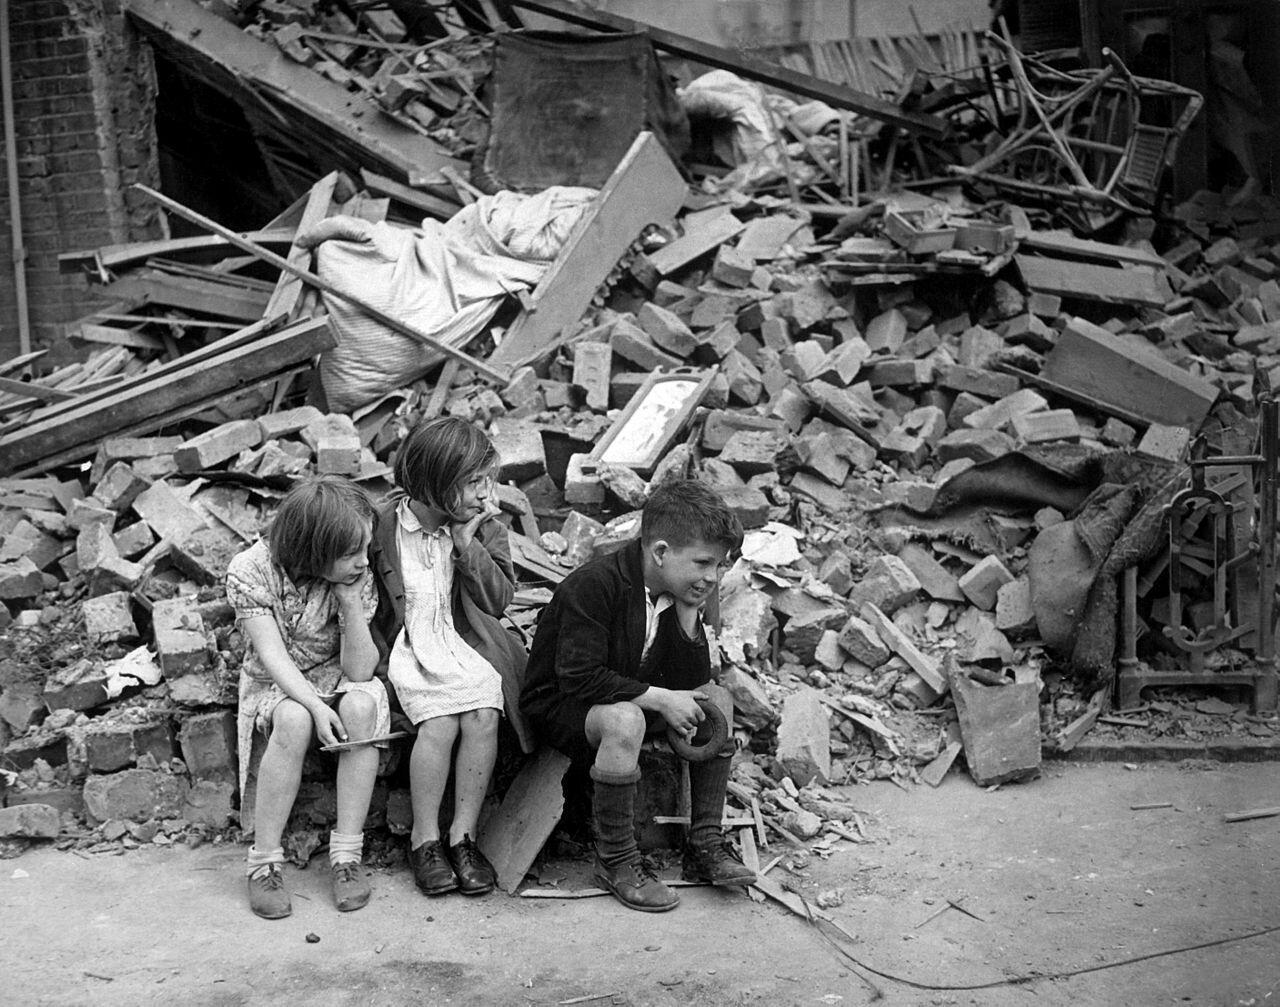 WWII_London_Blitz_East_London_War_Guerre_